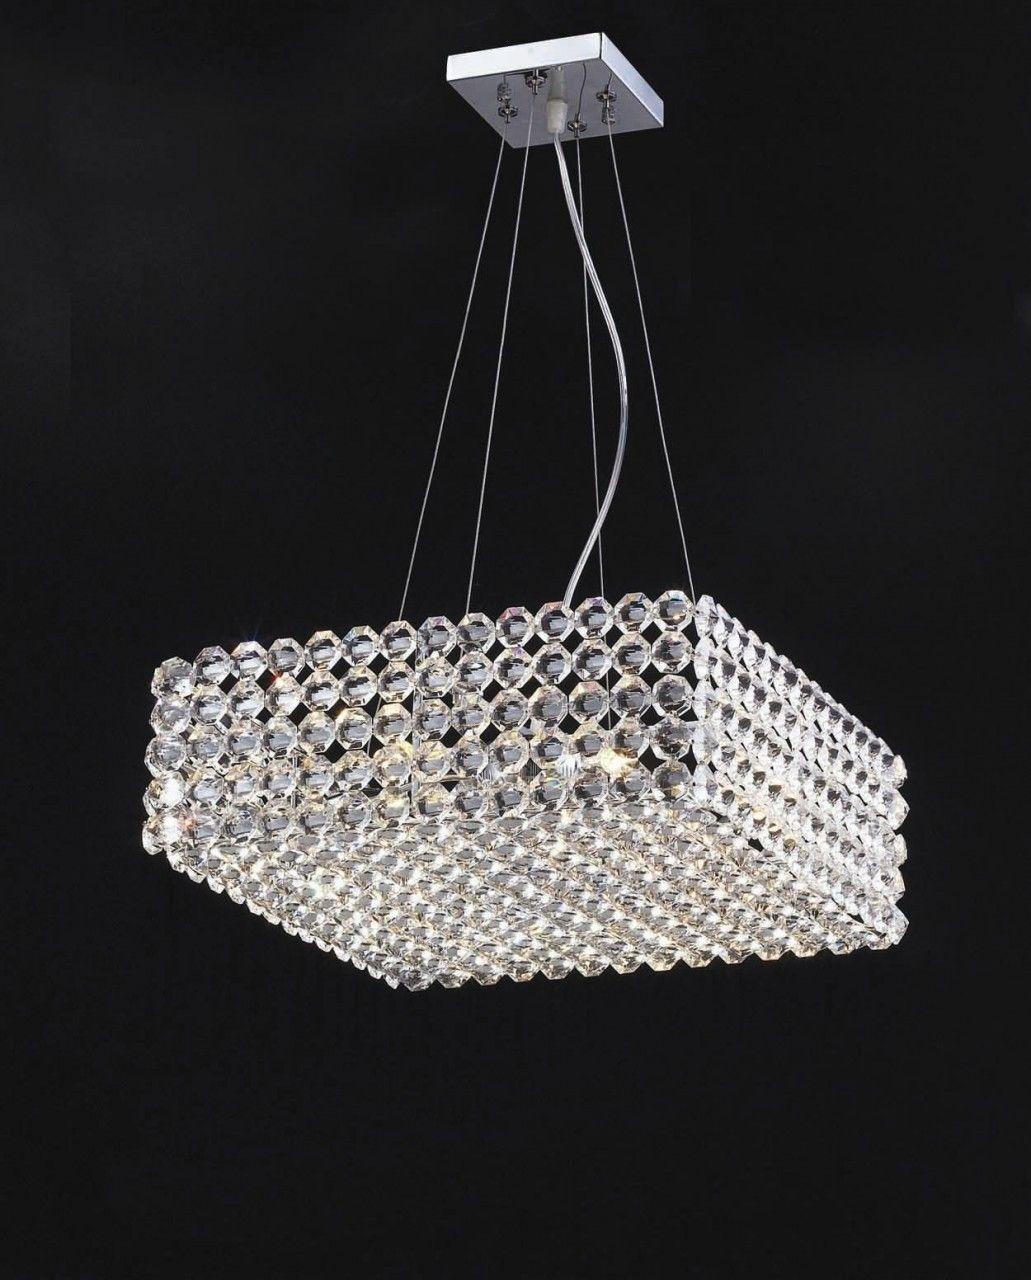 Italian Square Modular Crystal Pendant Designer Chandelier